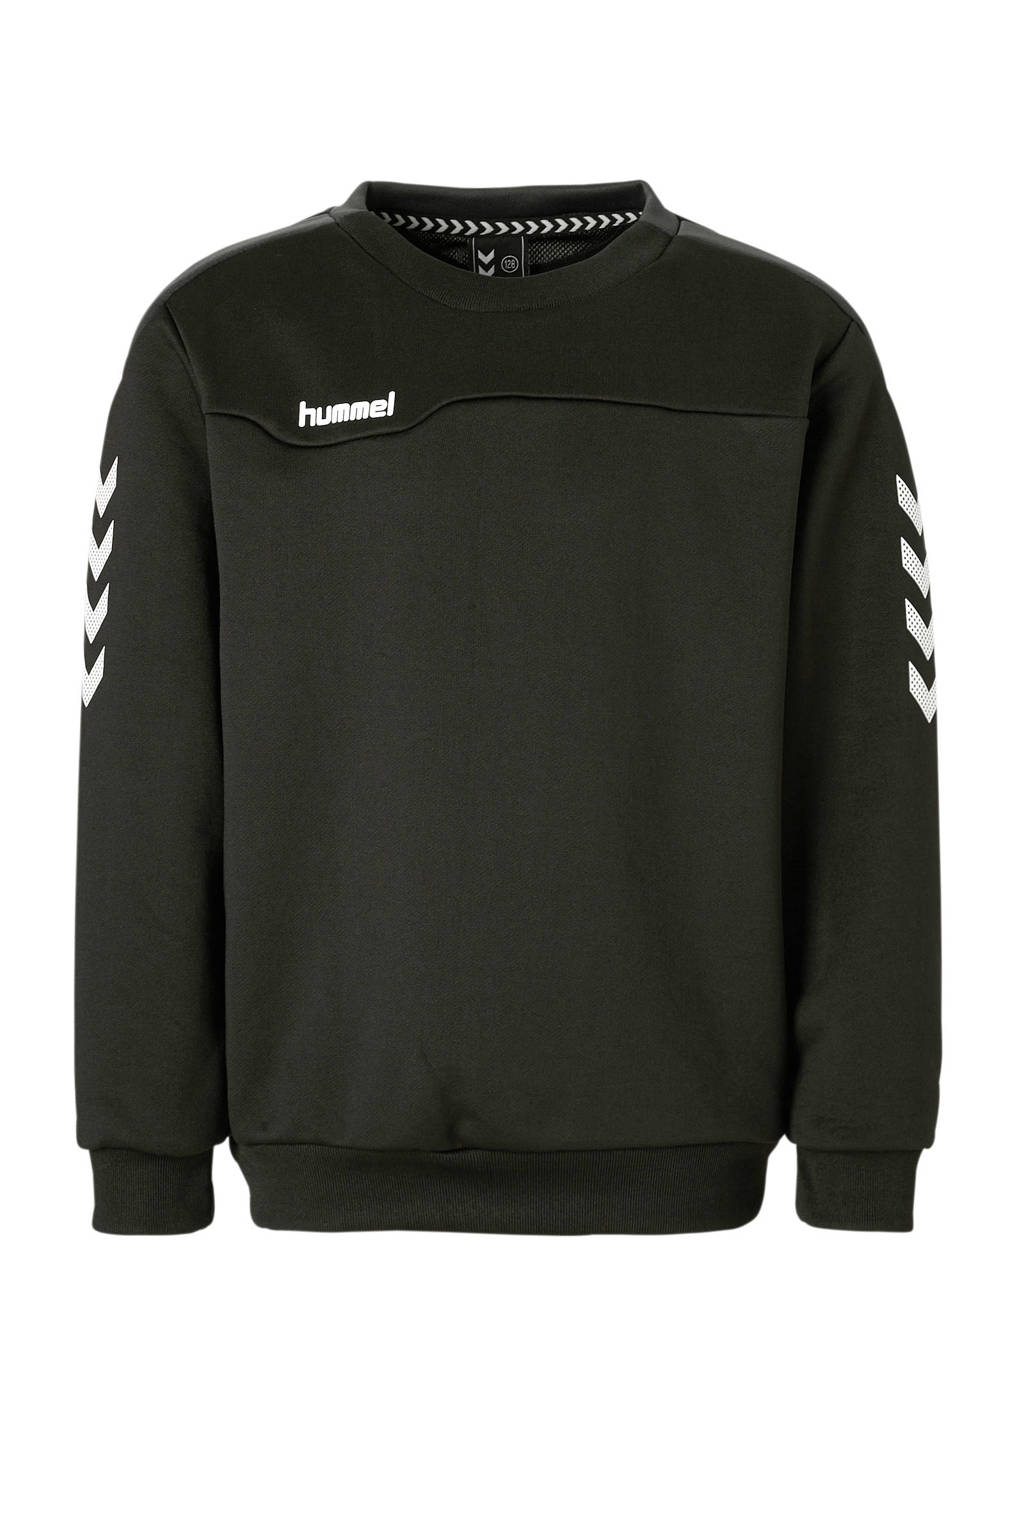 hummel   sportsweater zwart, Zwart/wit, Jongens